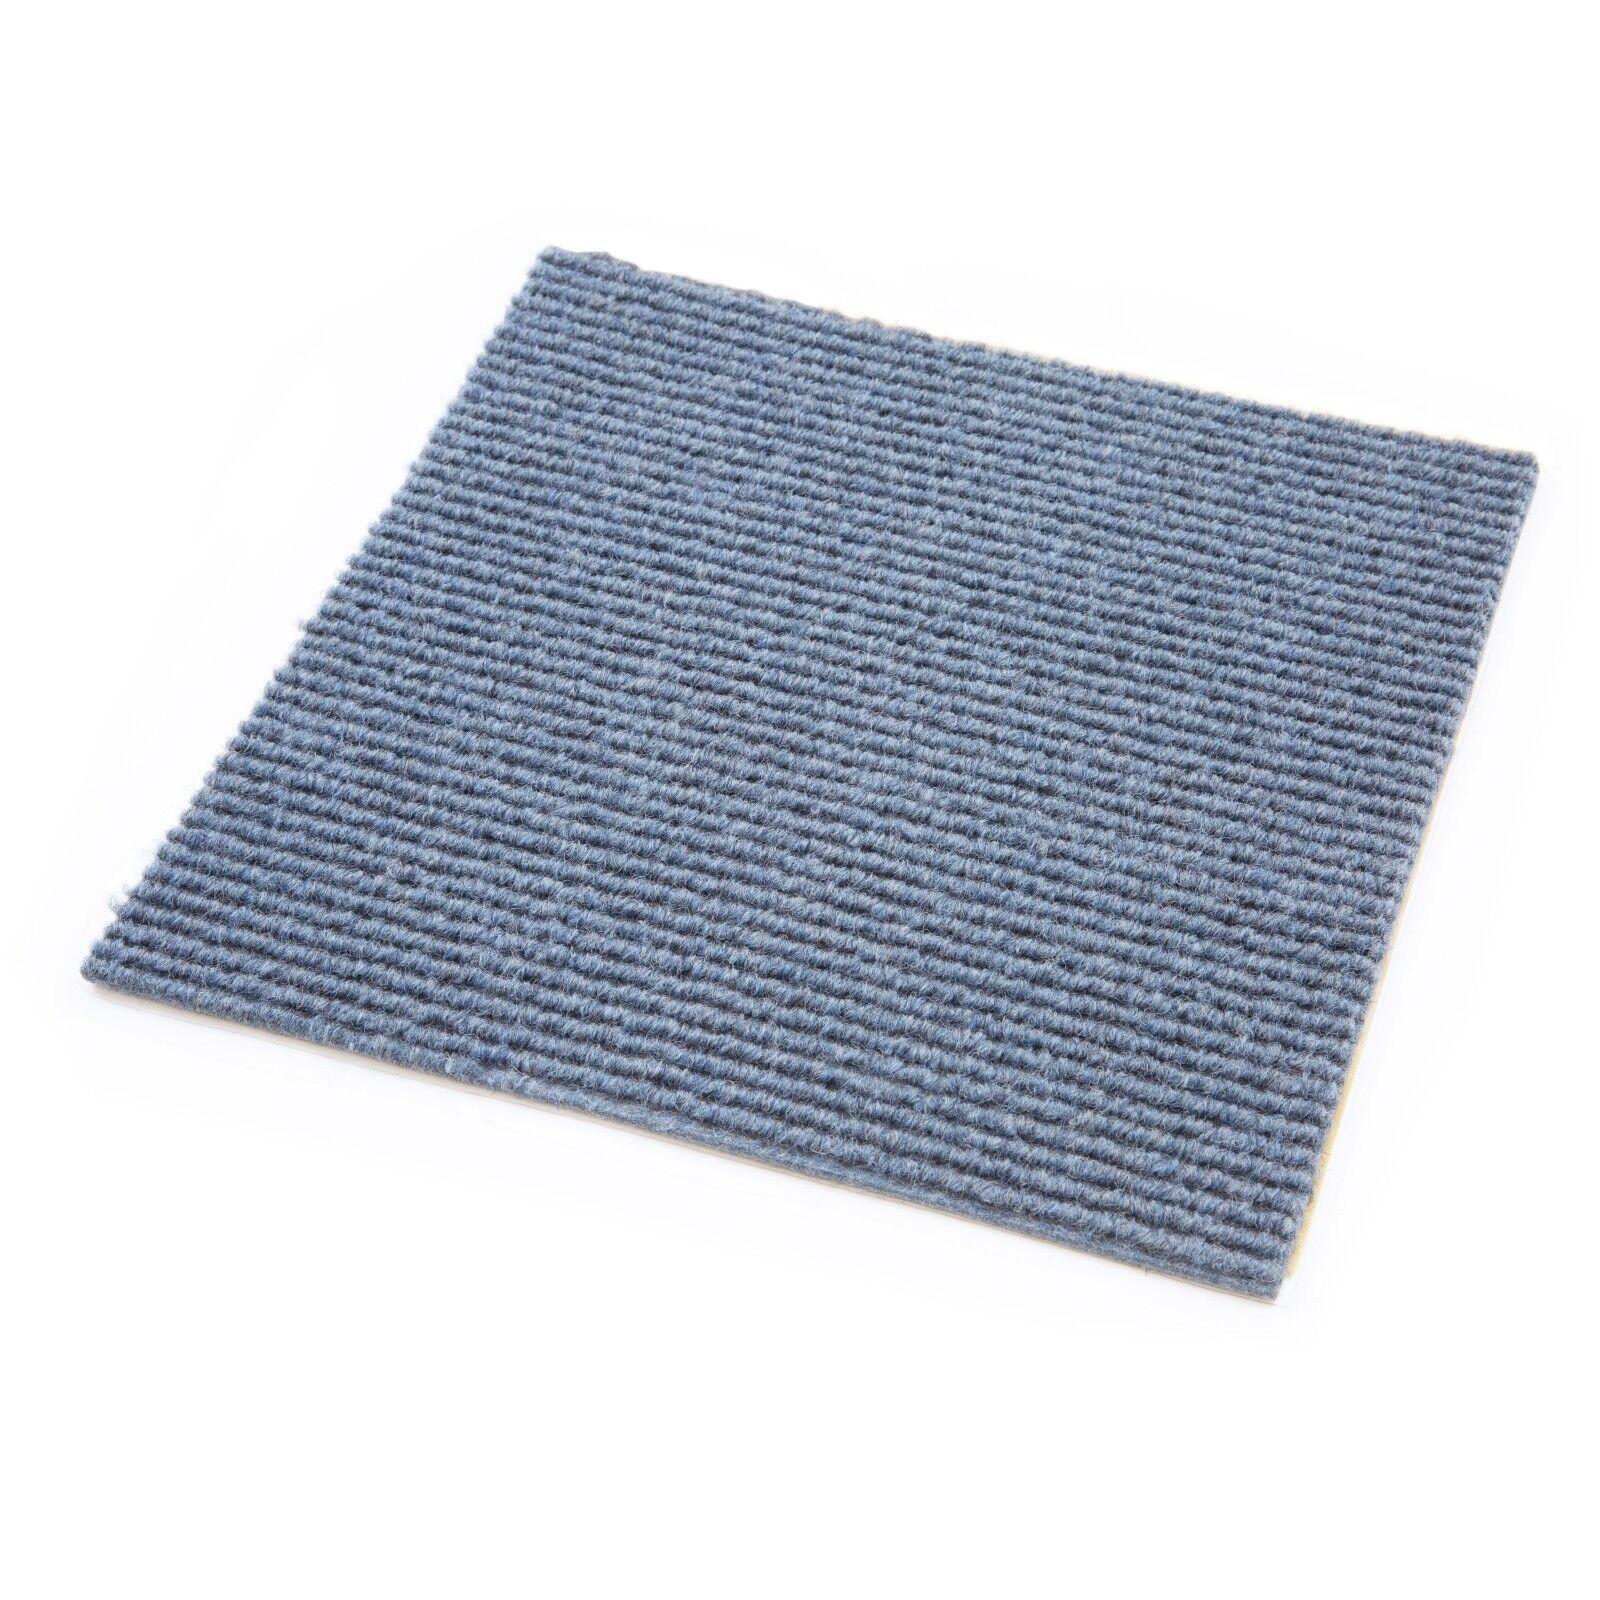 Flooringinc berber carpet tiles peel and stick 12 x 12 grey and brown